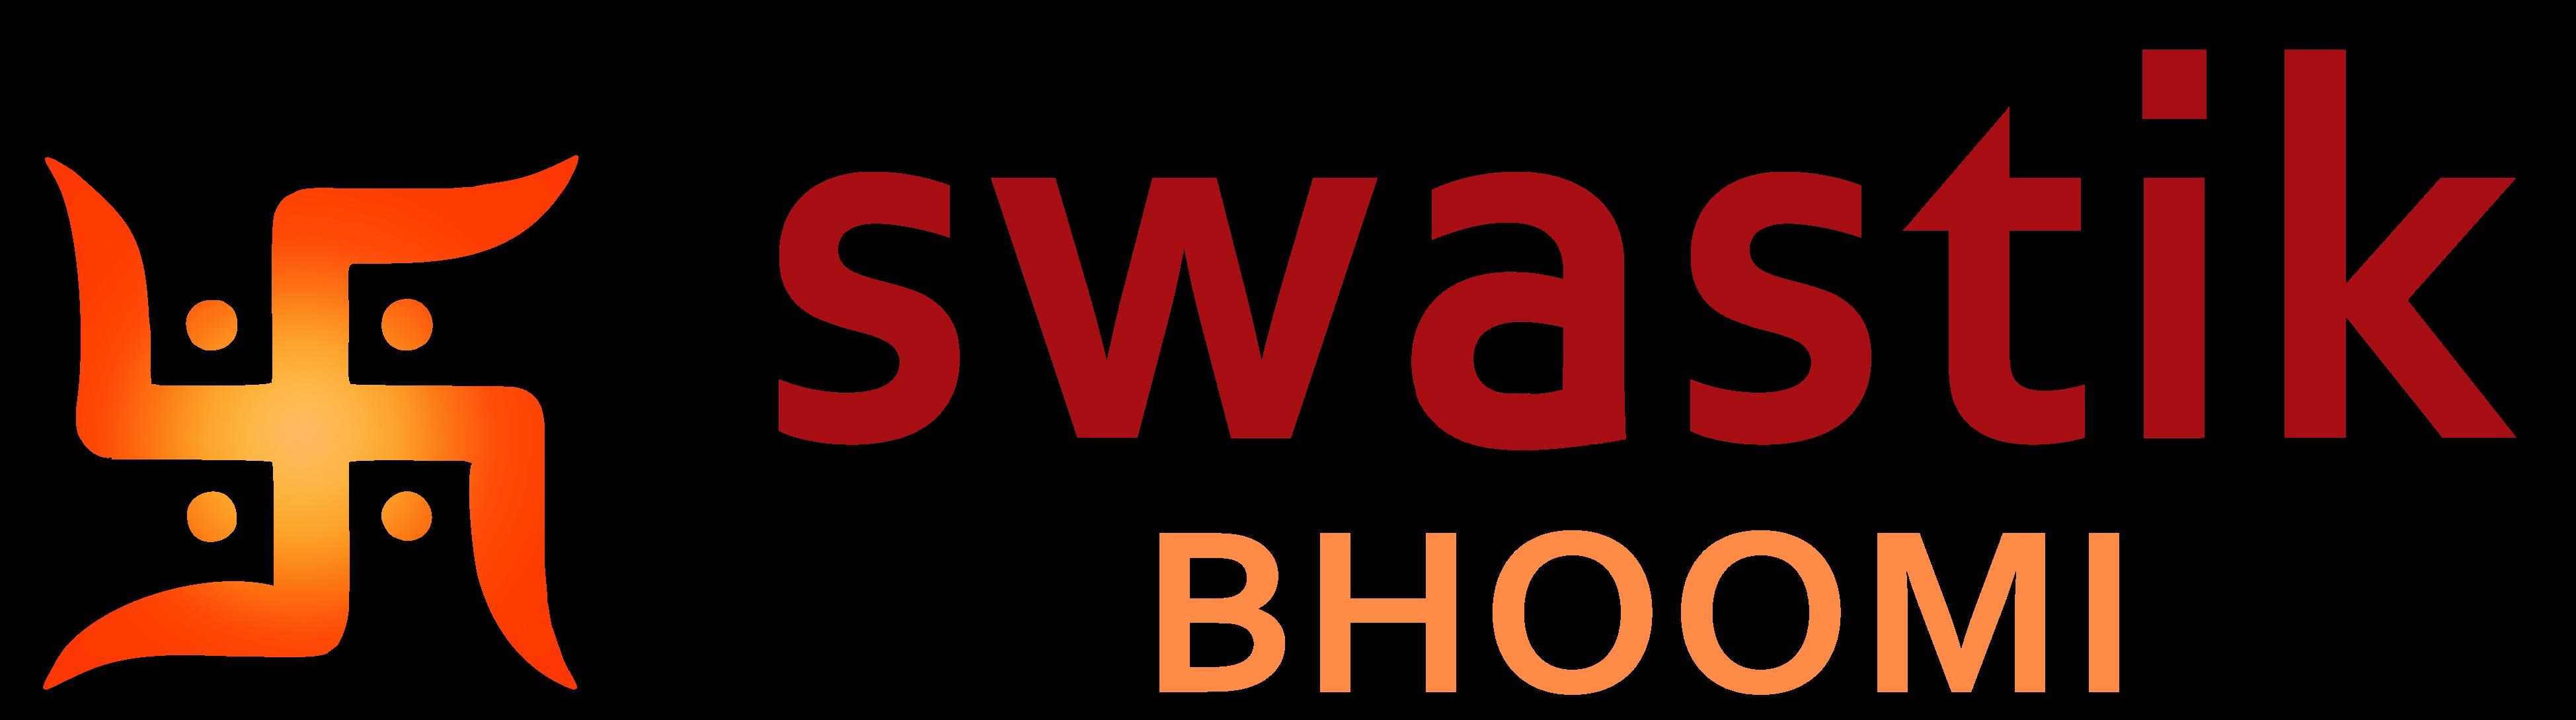 Swastik Bhoomi